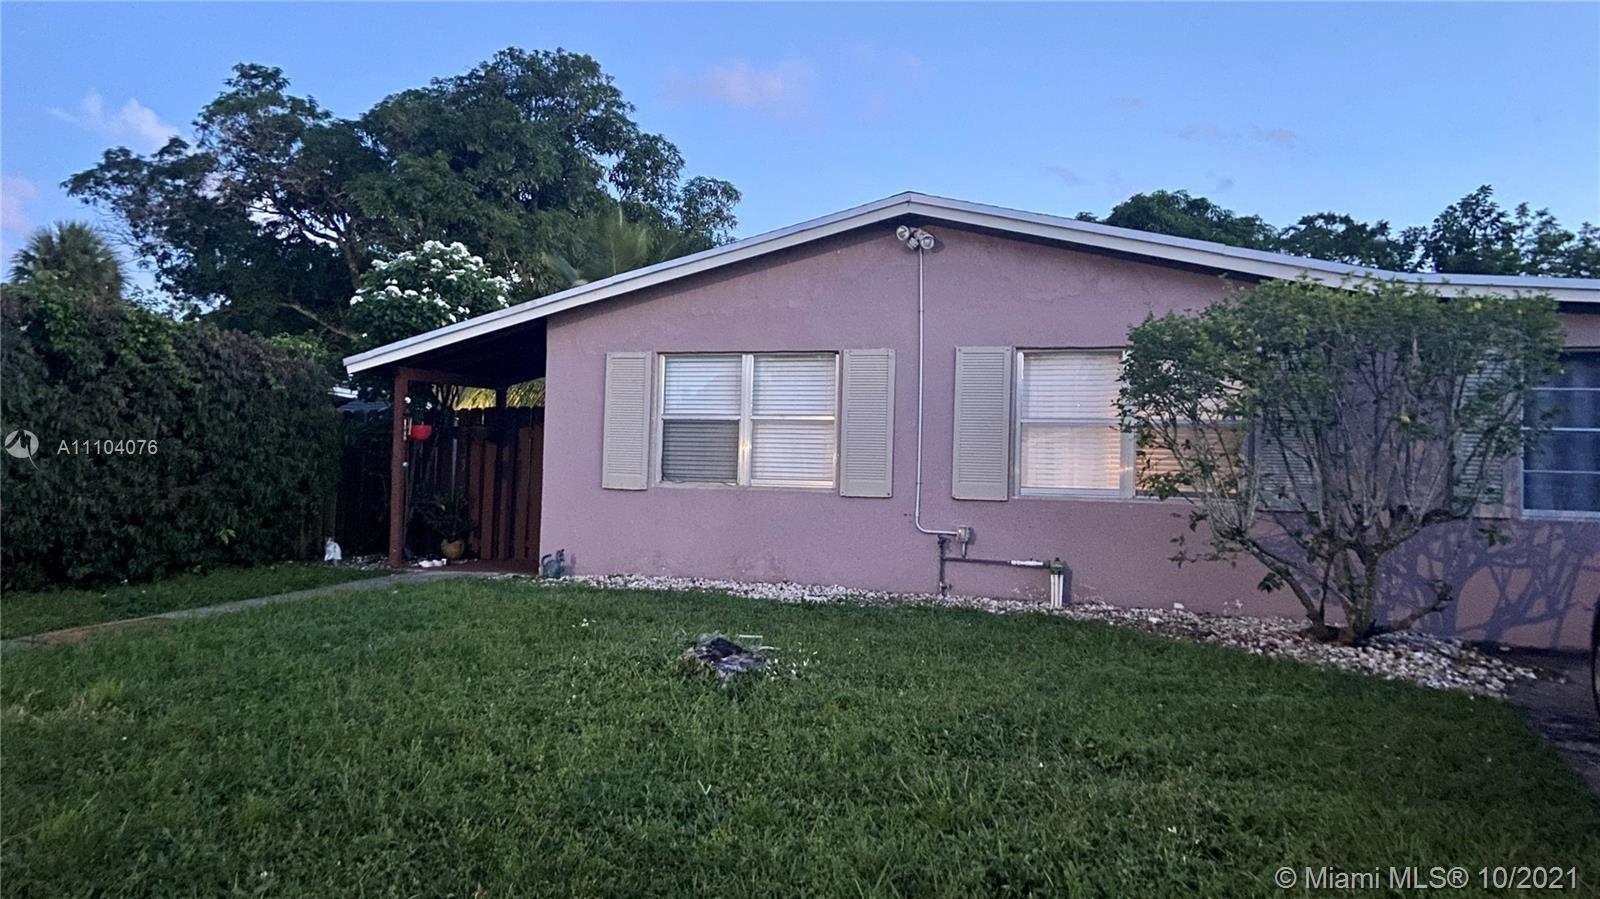 Photo of 6250 NW 14th St, Sunrise, FL 33313 (MLS # A11104076)